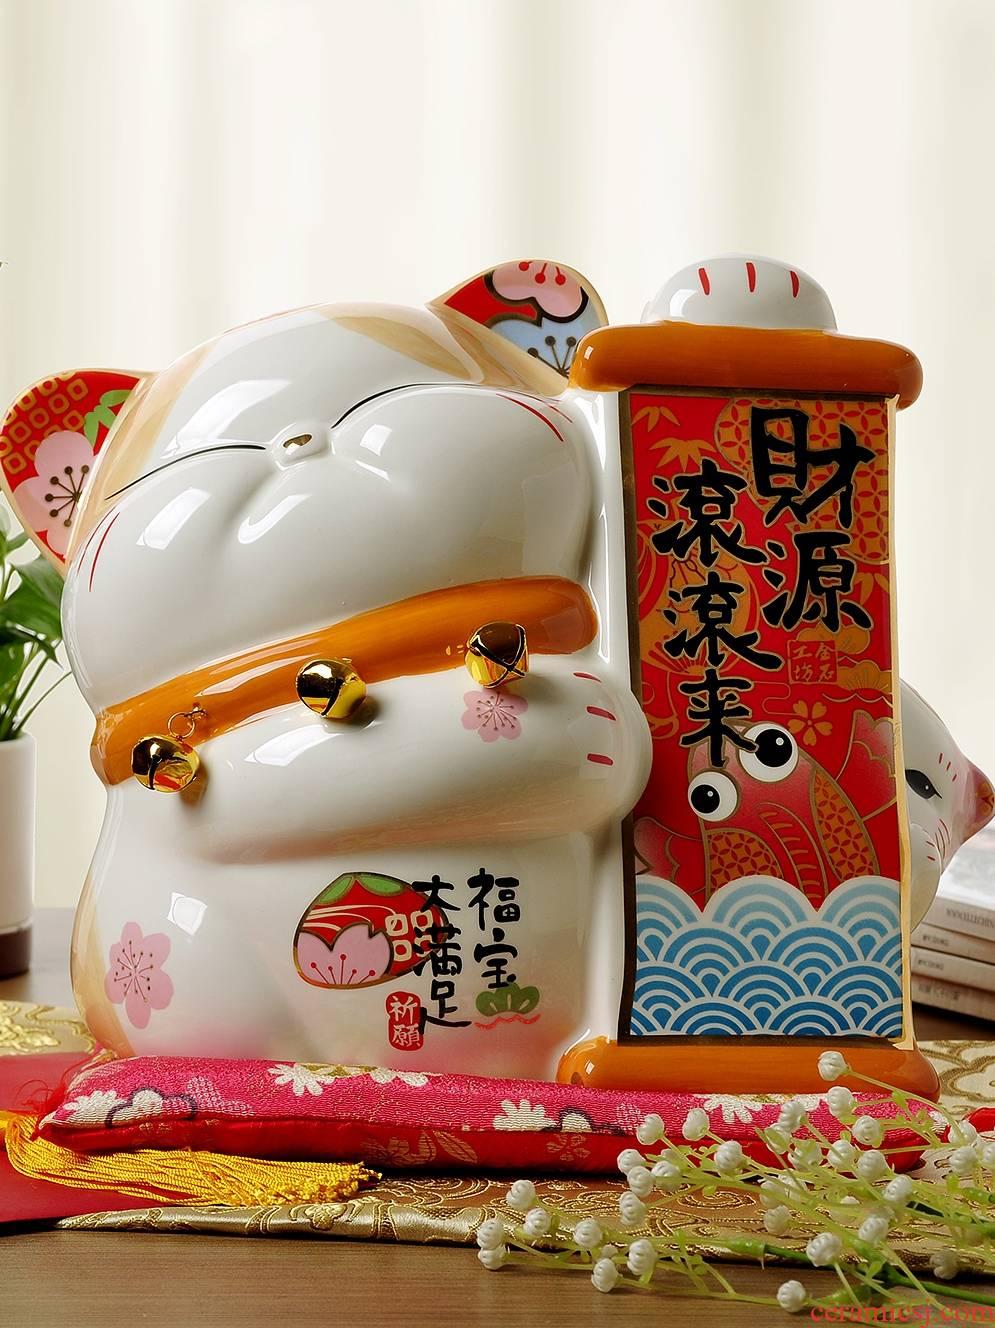 Stone workshop plutus cat furnishing articles store opening ceramic oversized rich saving money piggy bank creative gift